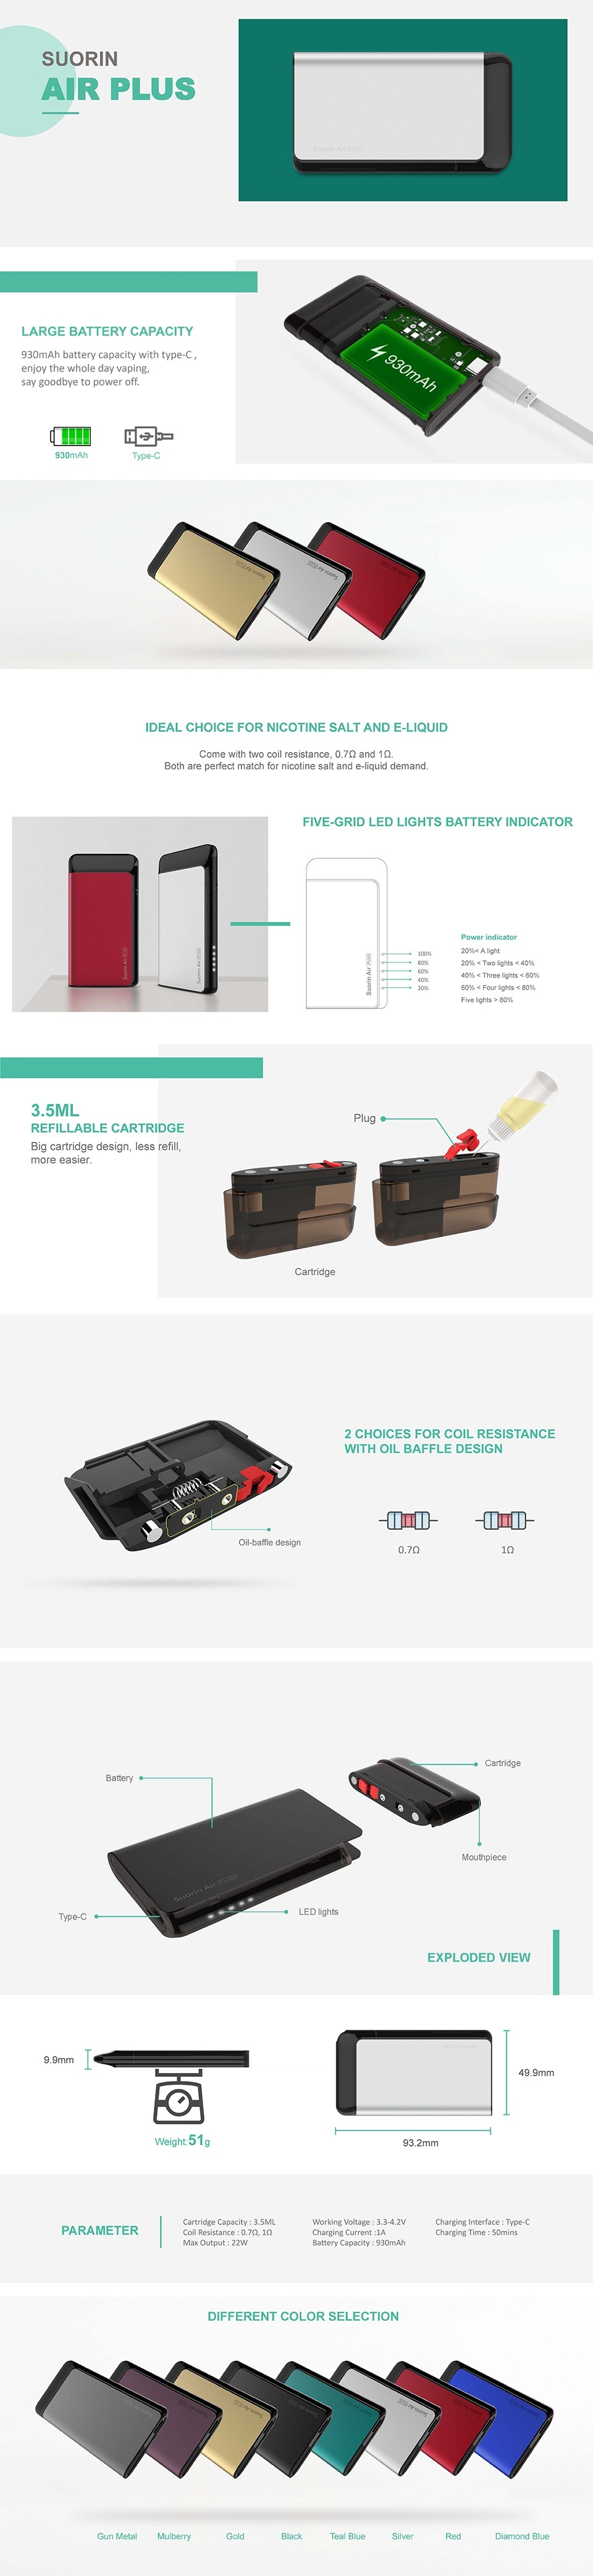 Suorin Air Plus Kit Infographic